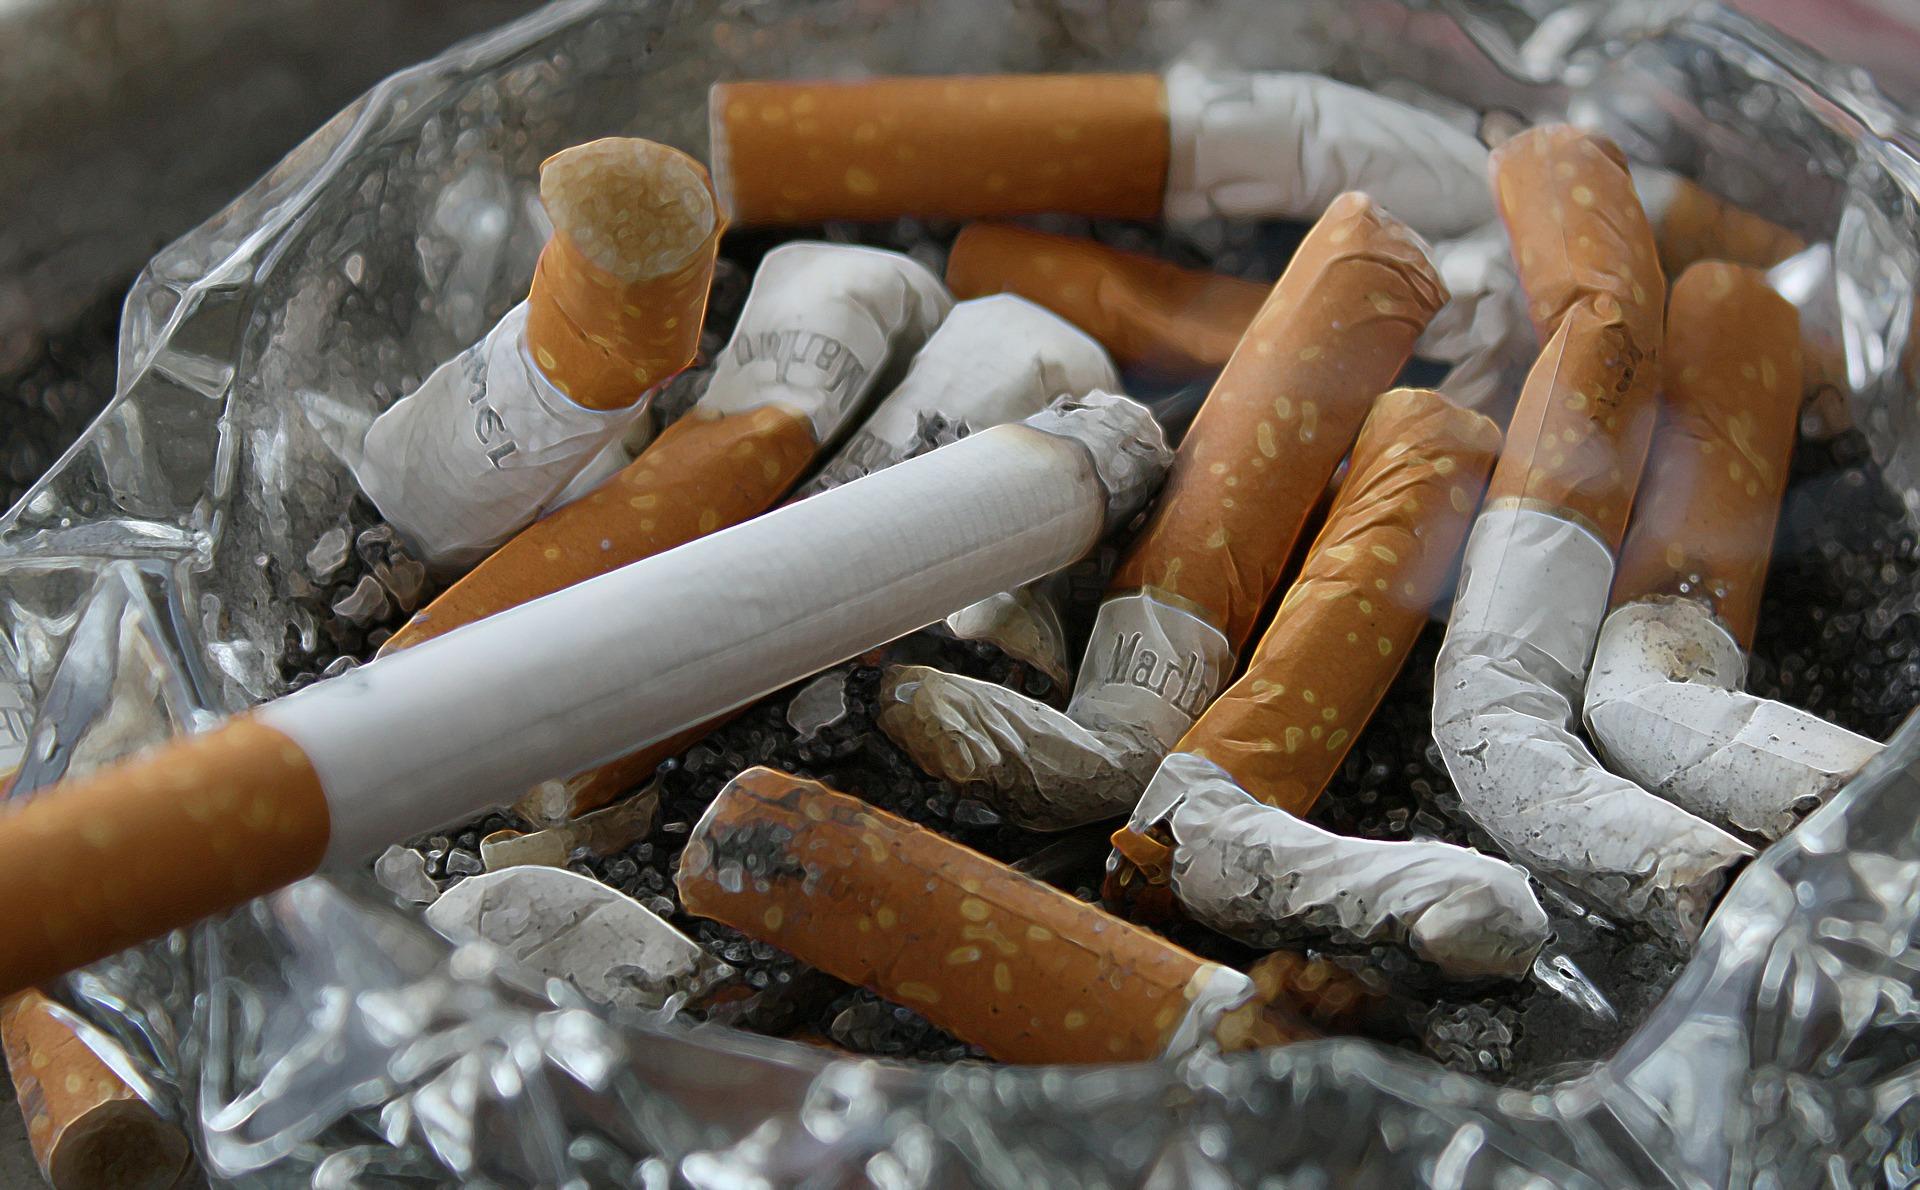 Smoking and Vision Lost